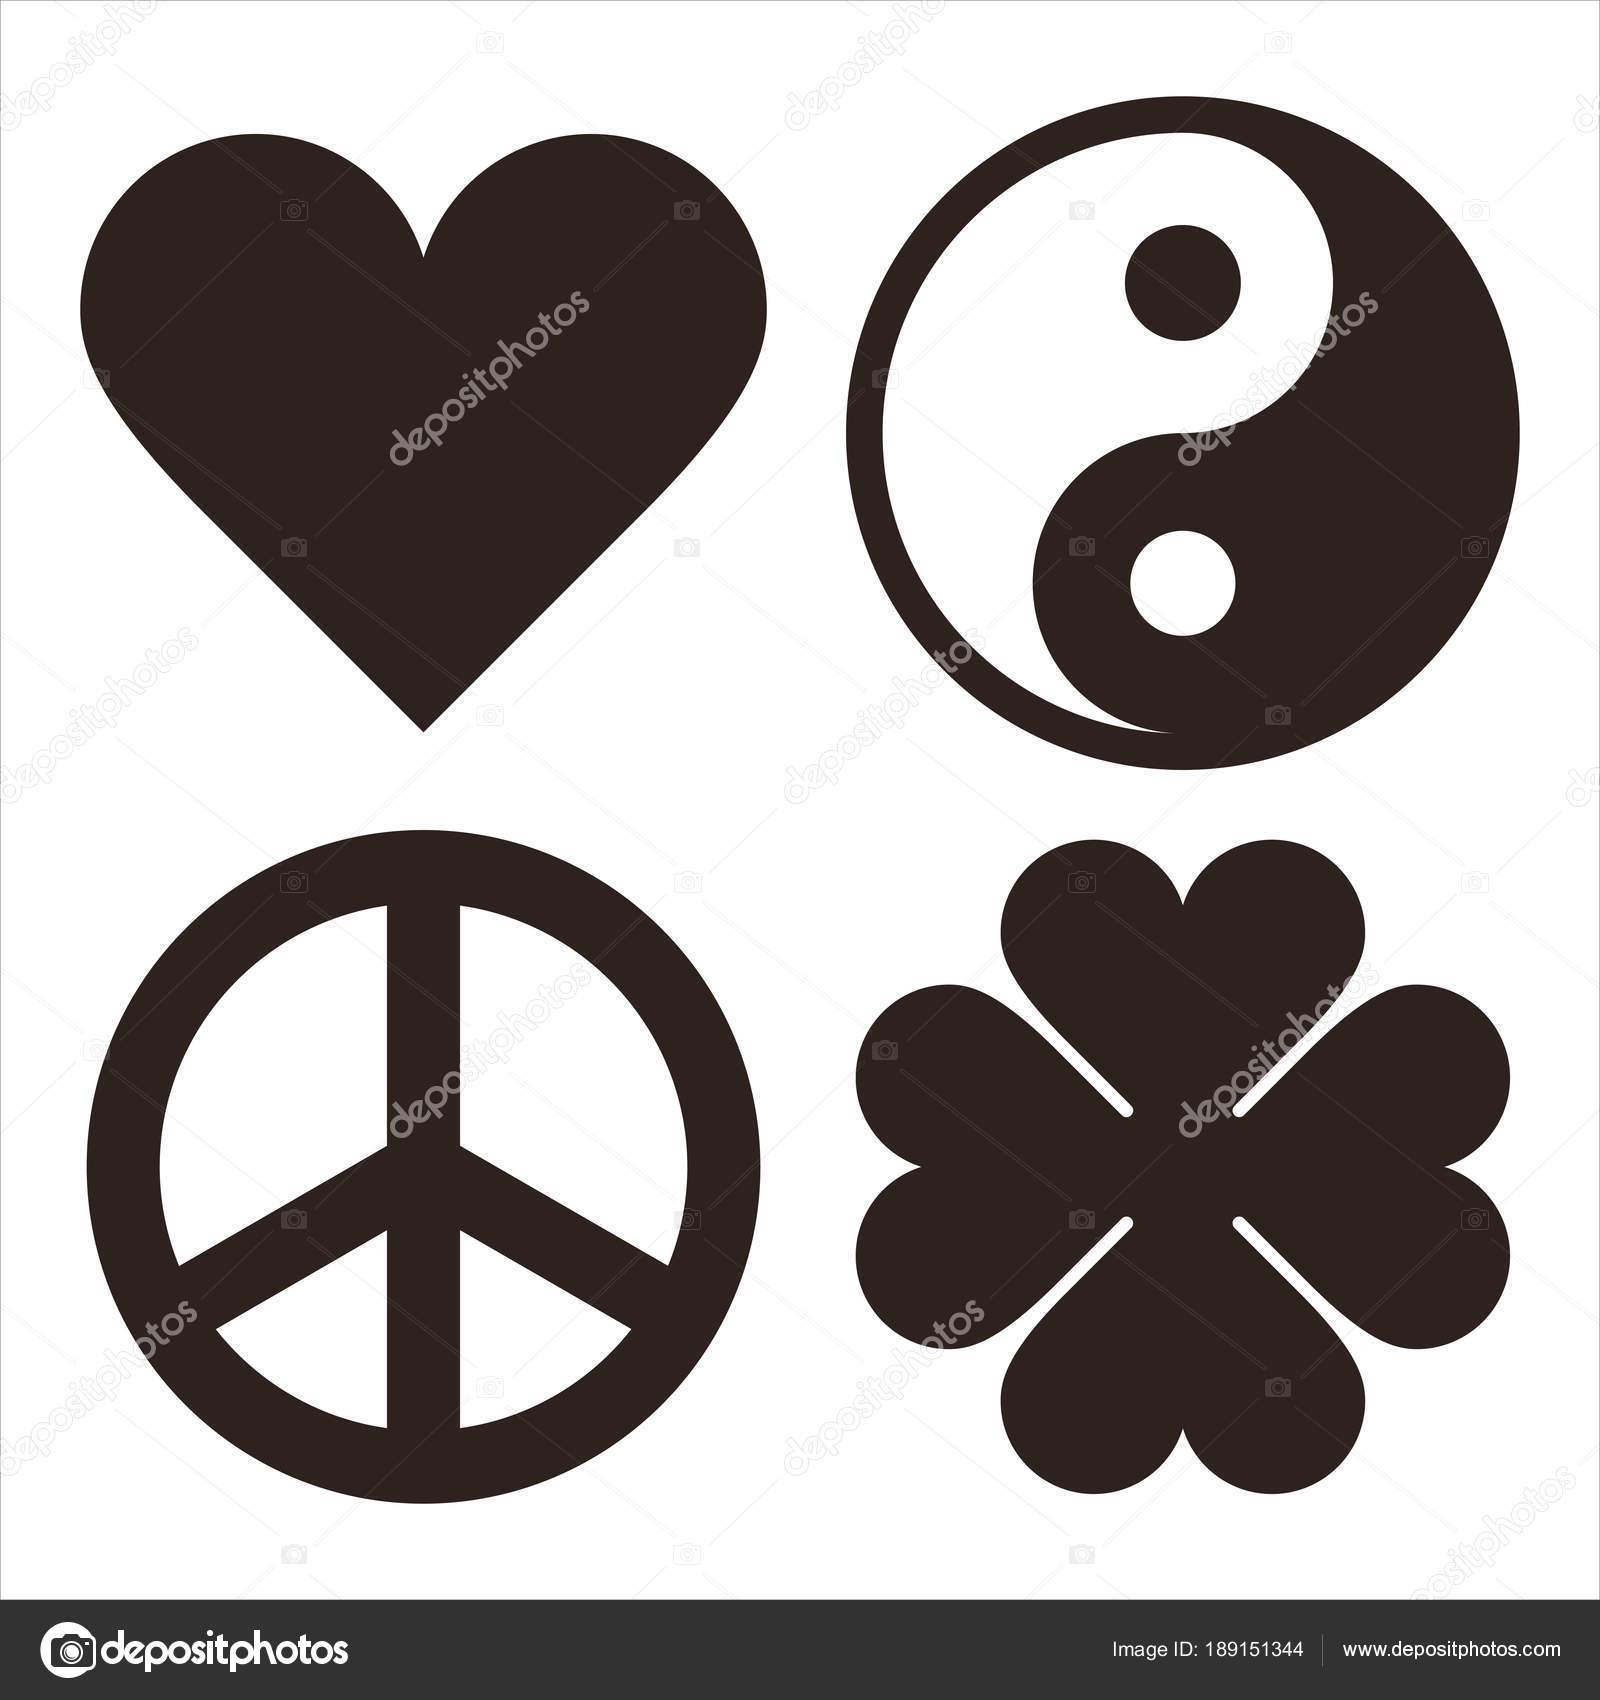 Heart Yin Yang Peace Symbol And Clover Symols Stock Vector